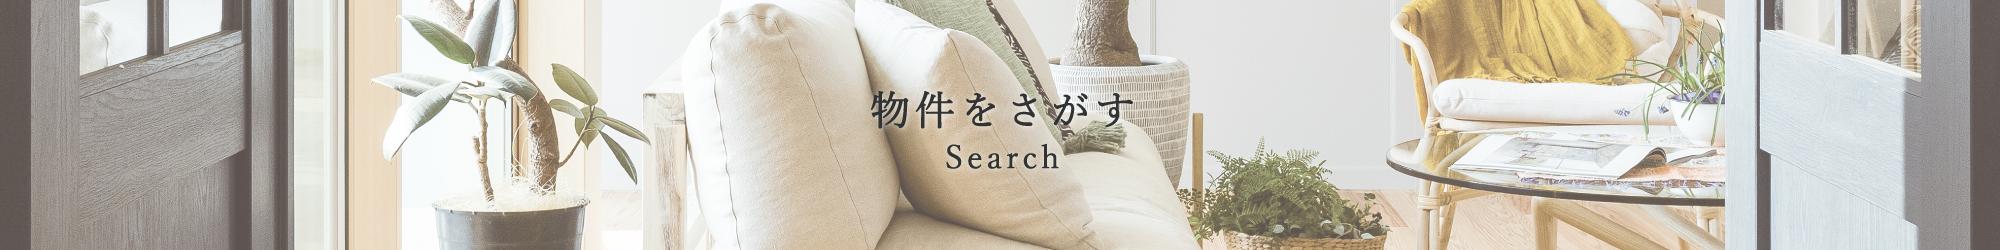 title_serch